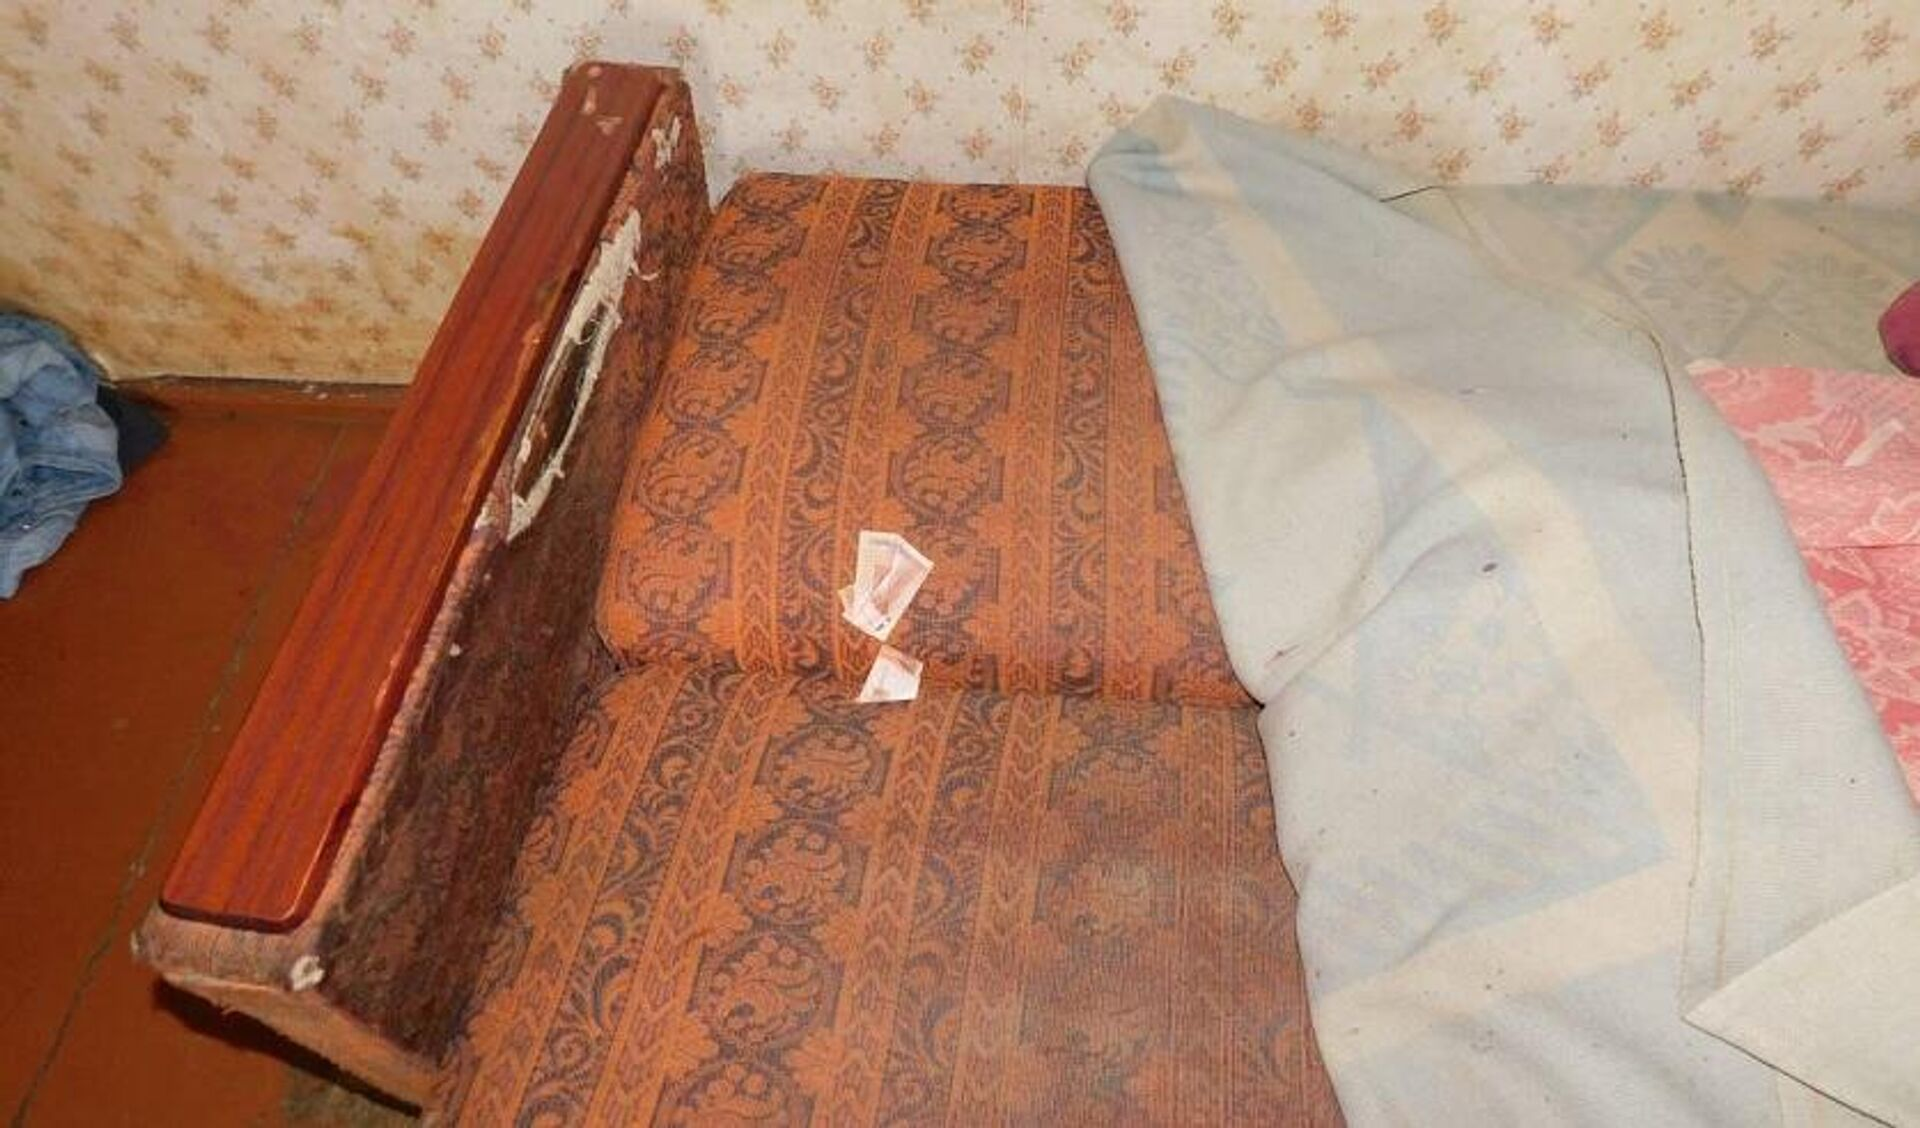 Мужчина убил мать за 10 рублей - Sputnik Беларусь, 1920, 21.09.2021